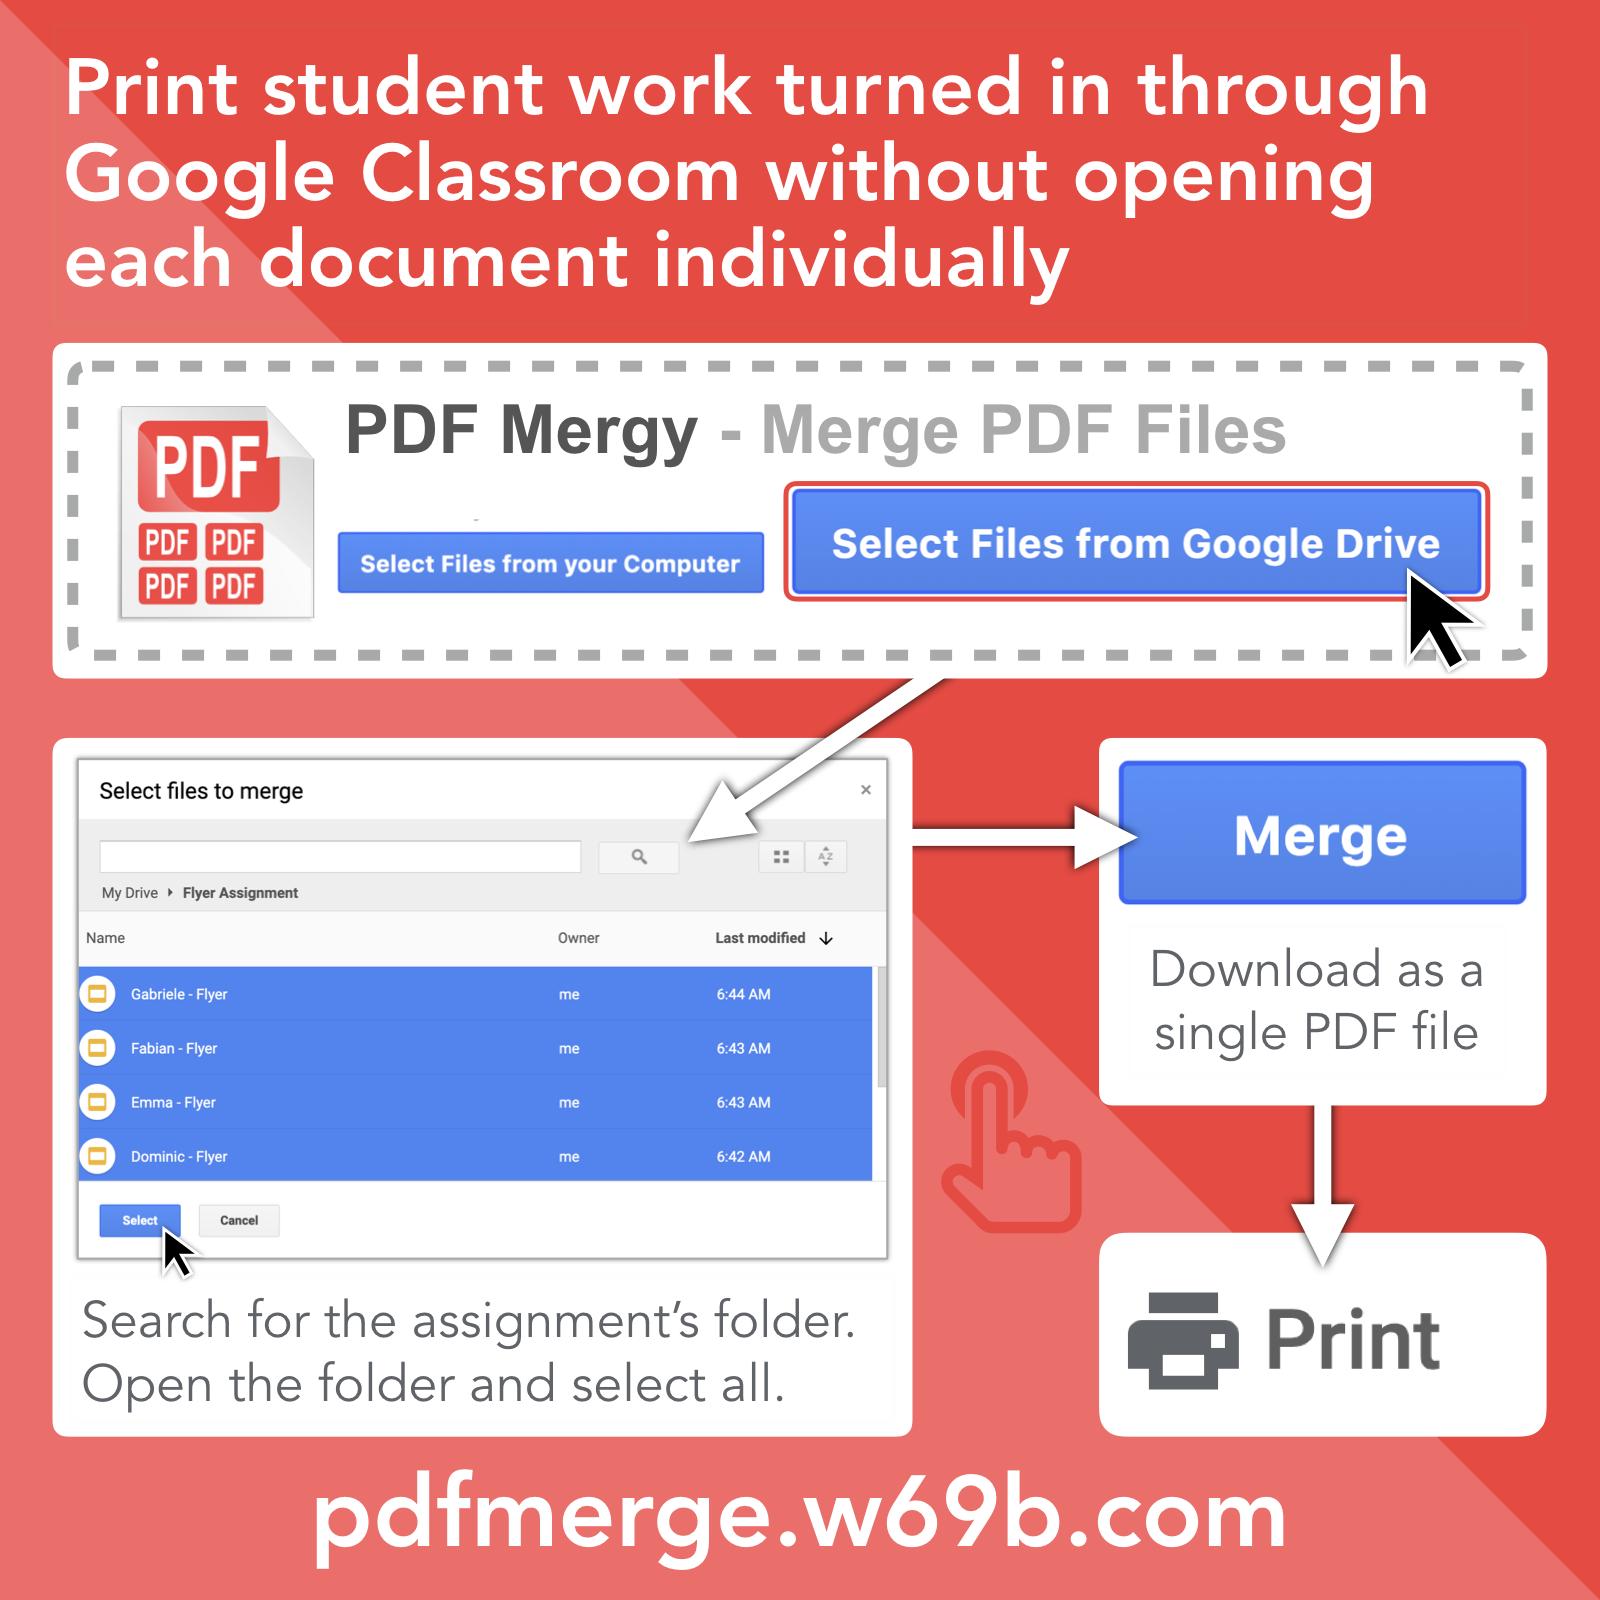 PDF Mergy Instructions